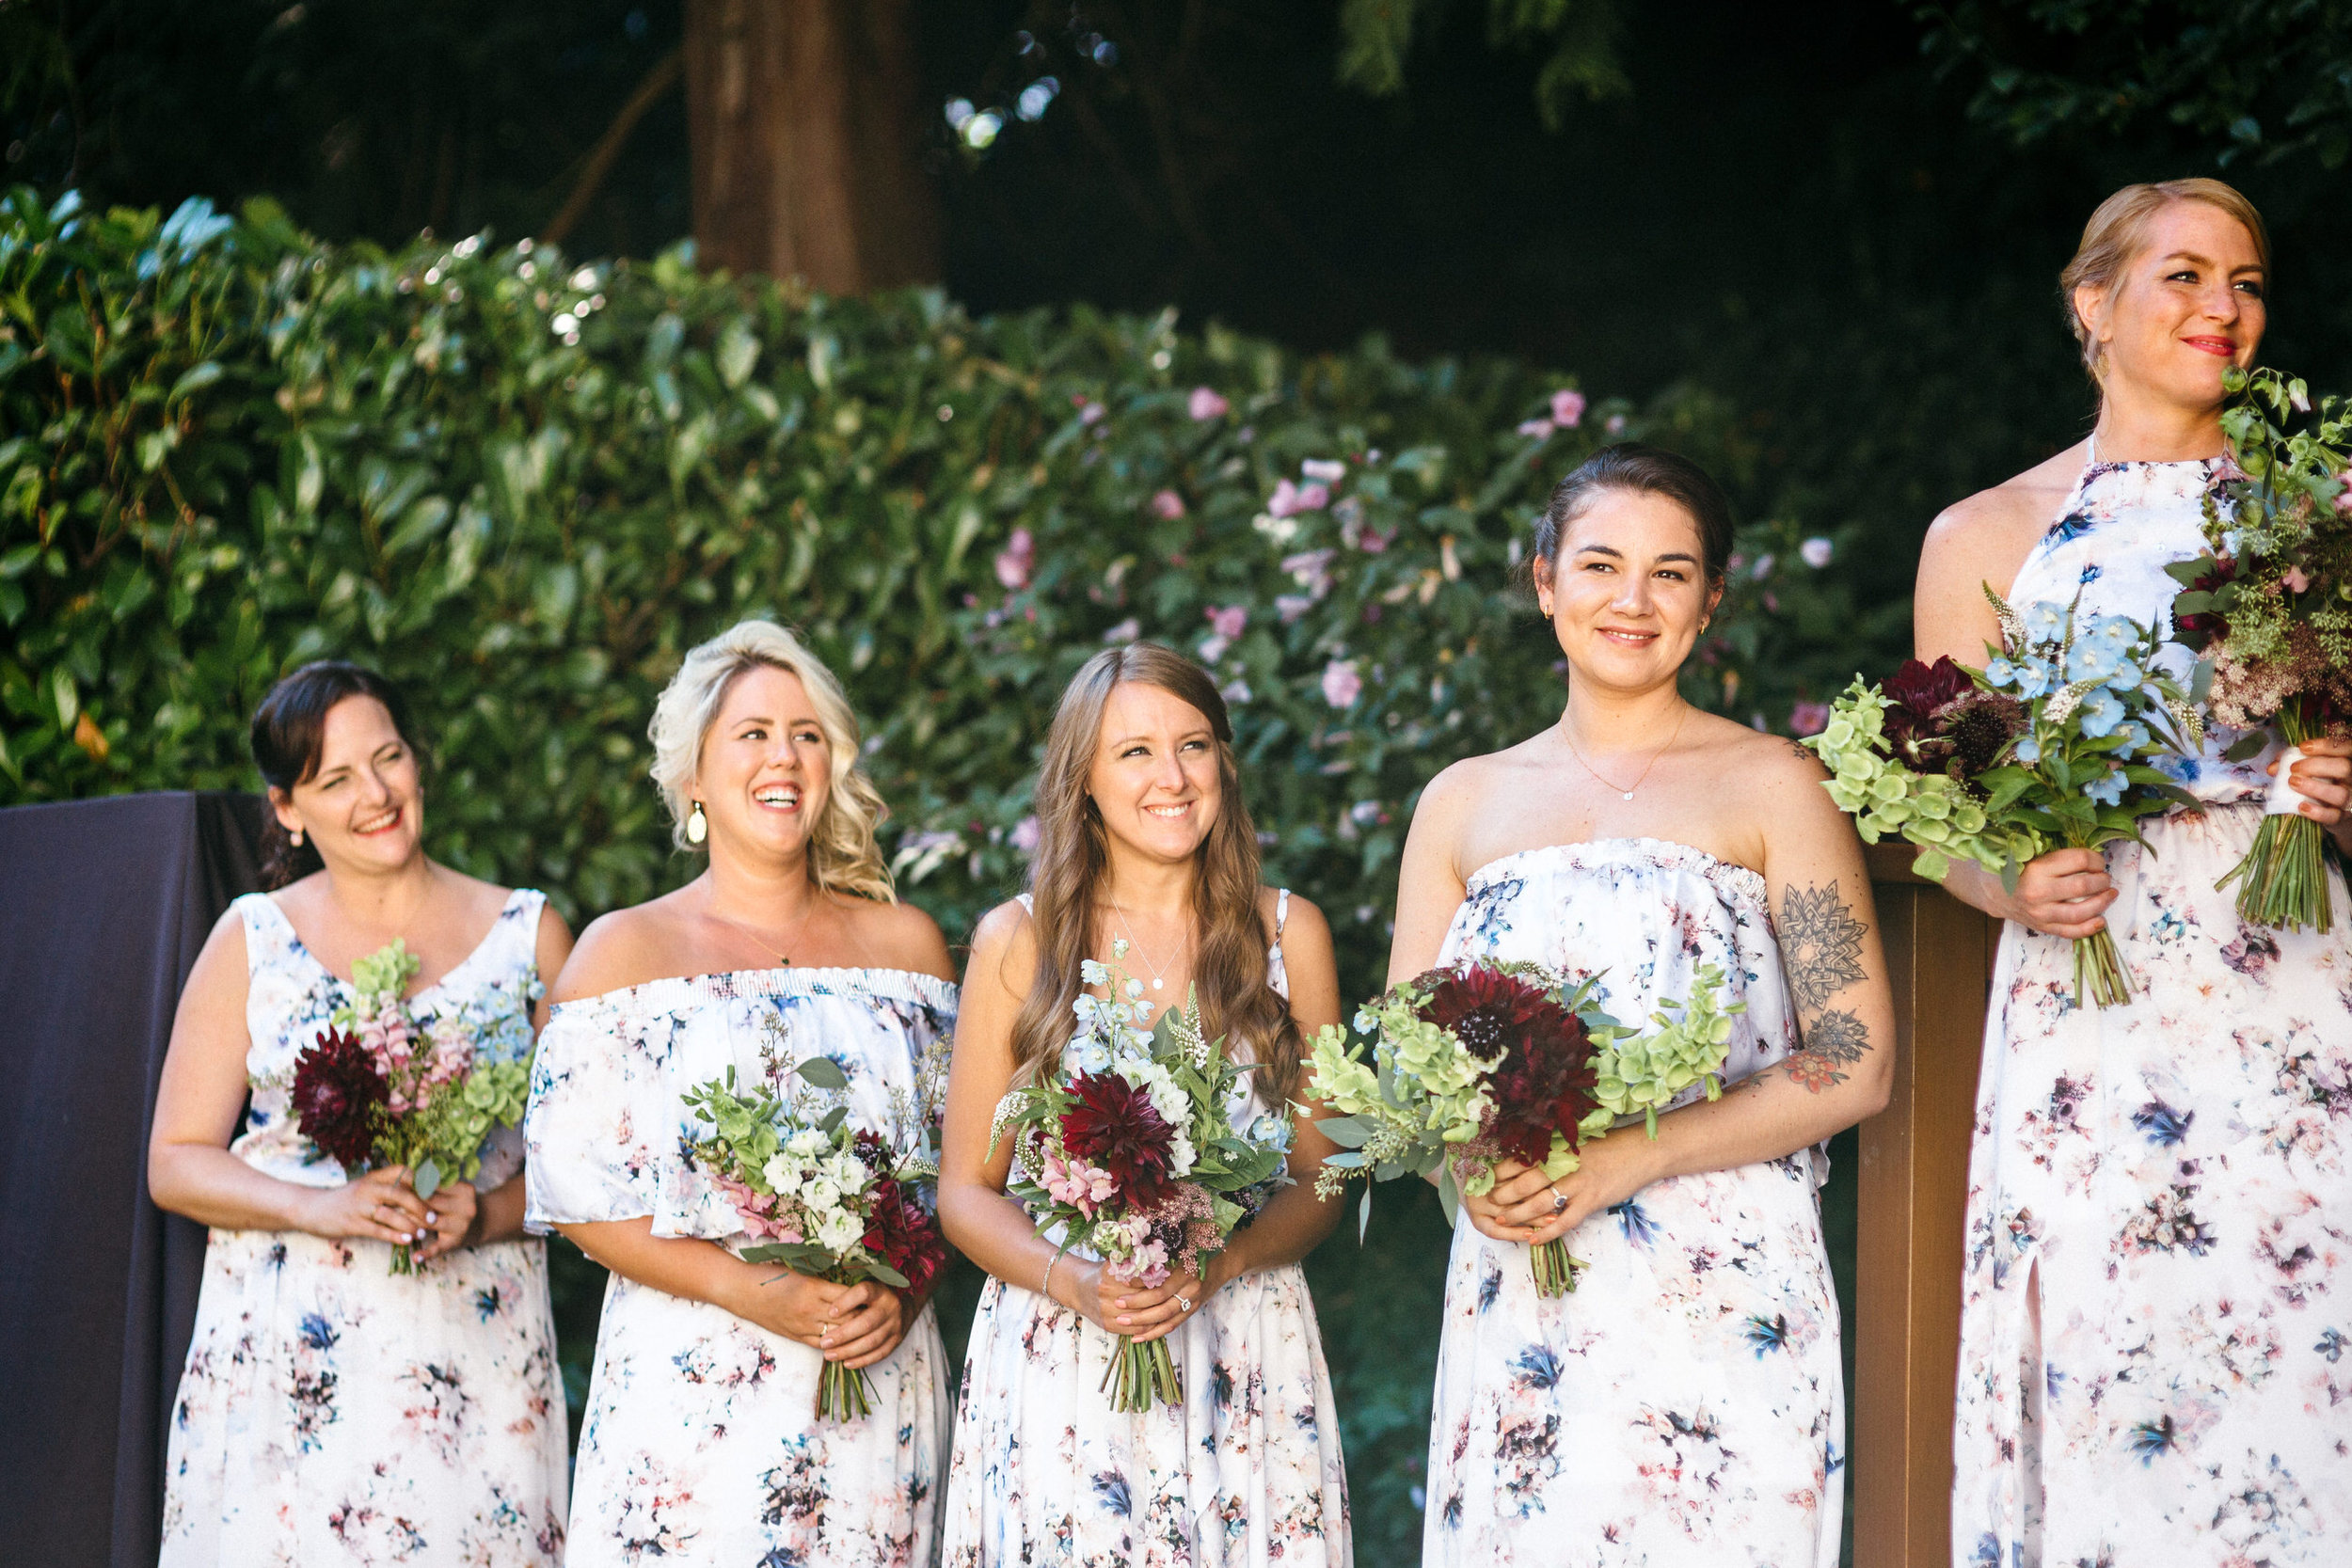 Laurelhurst Park club wedding photographer Portand pdx Oregon056.JPG